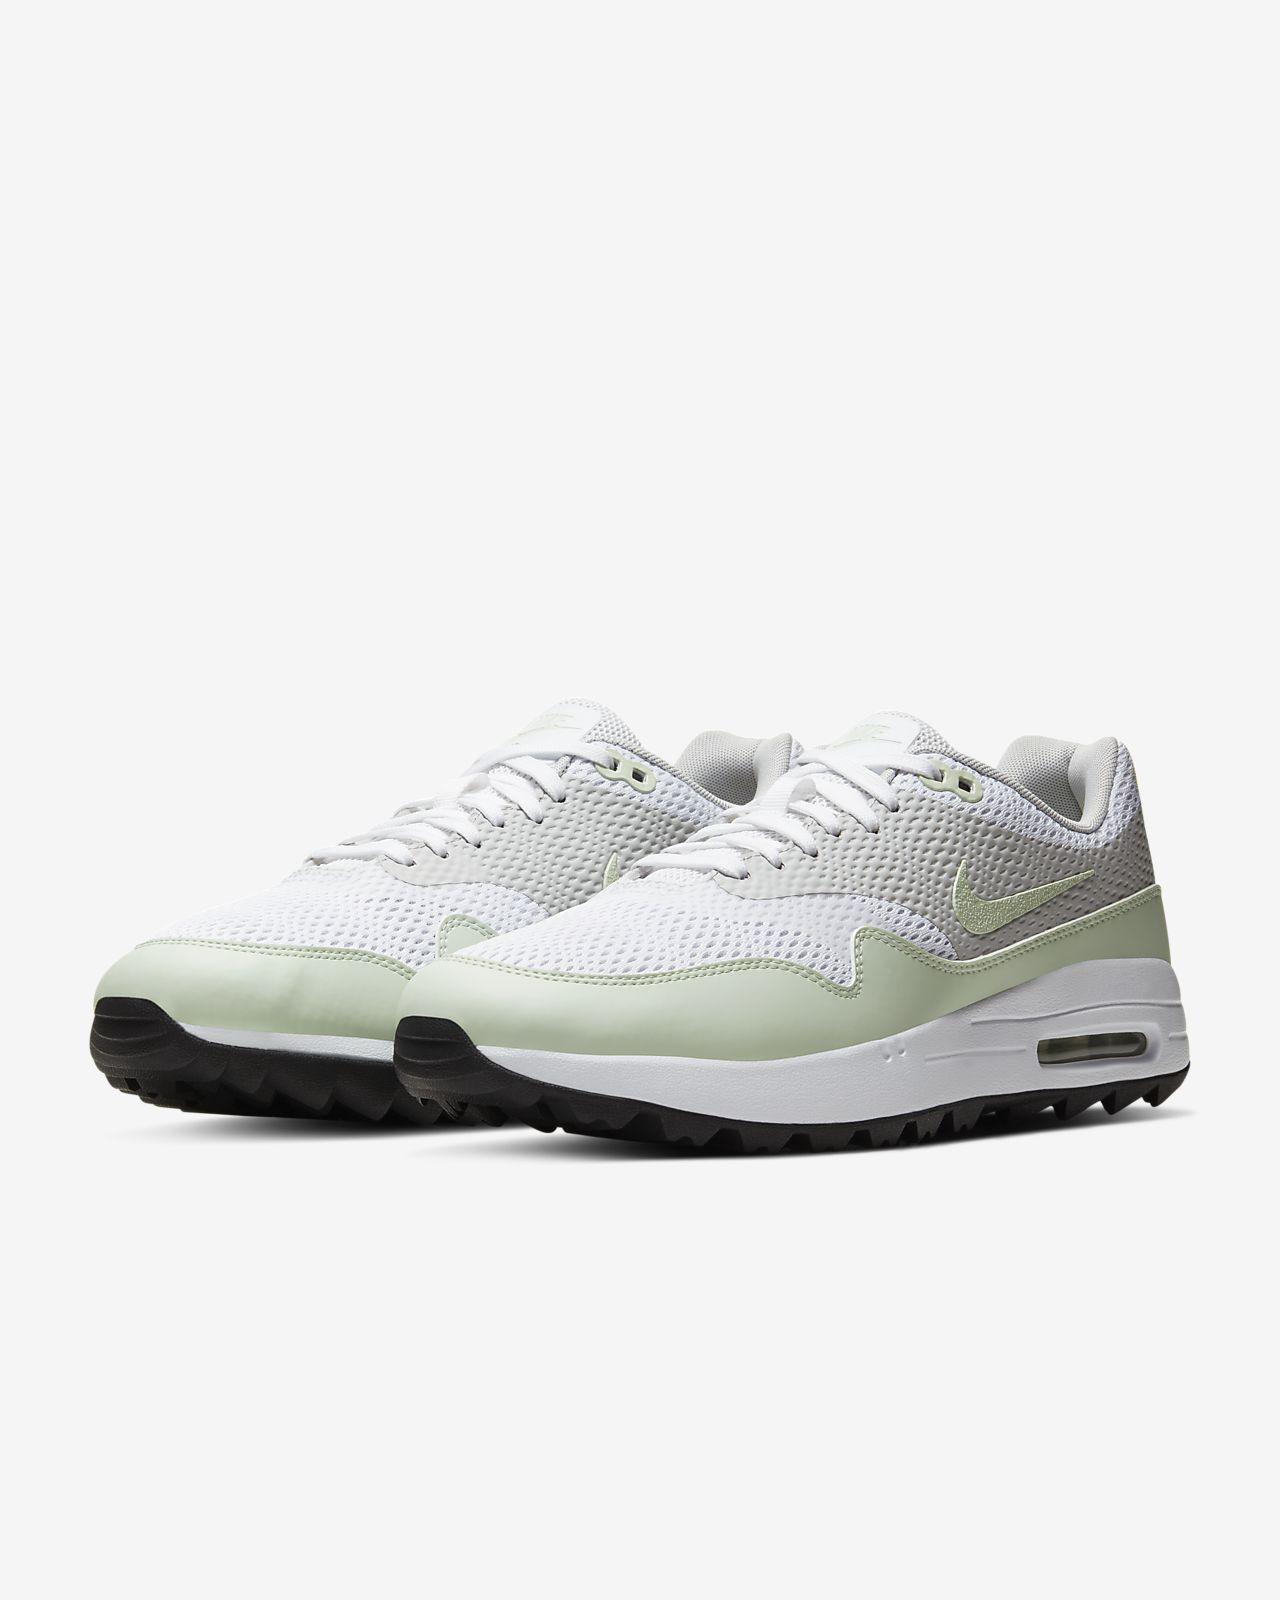 air max 1 gris et vert